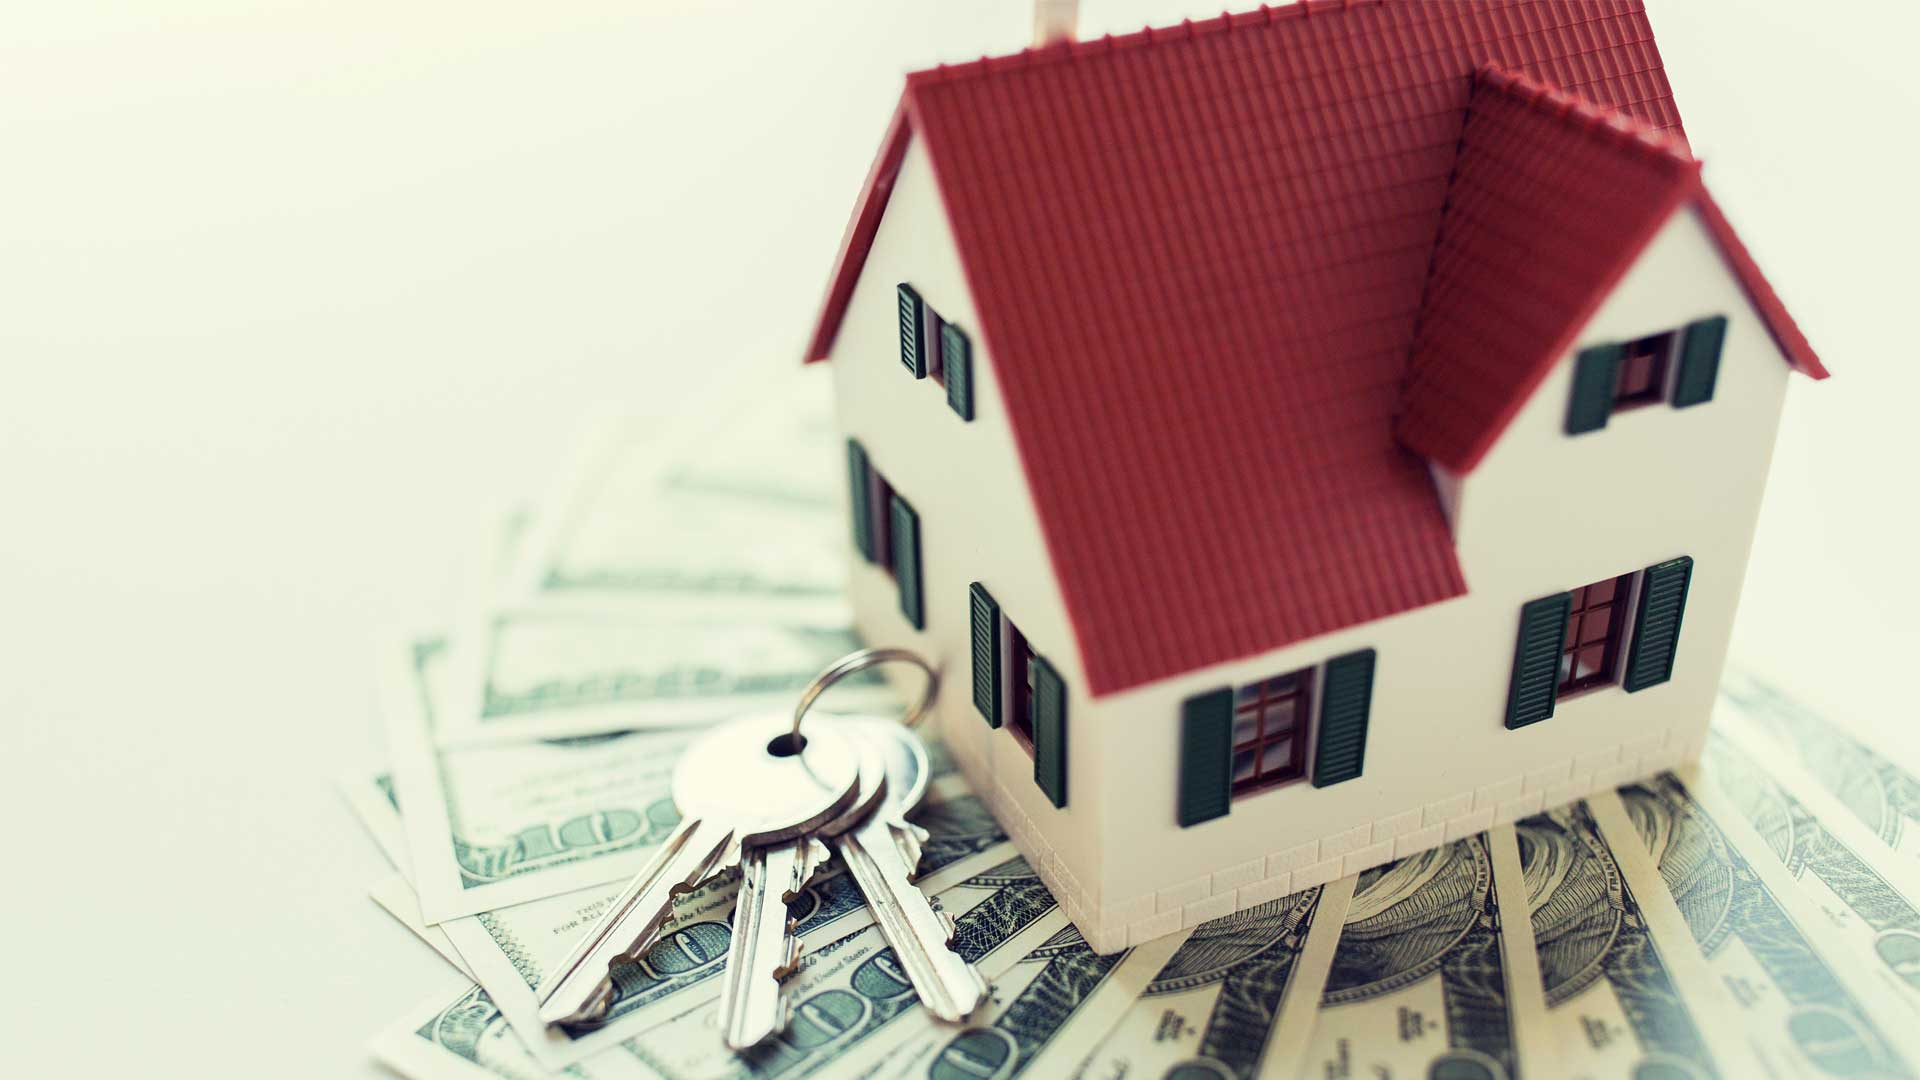 займ под залог недвижимости срочно за 1